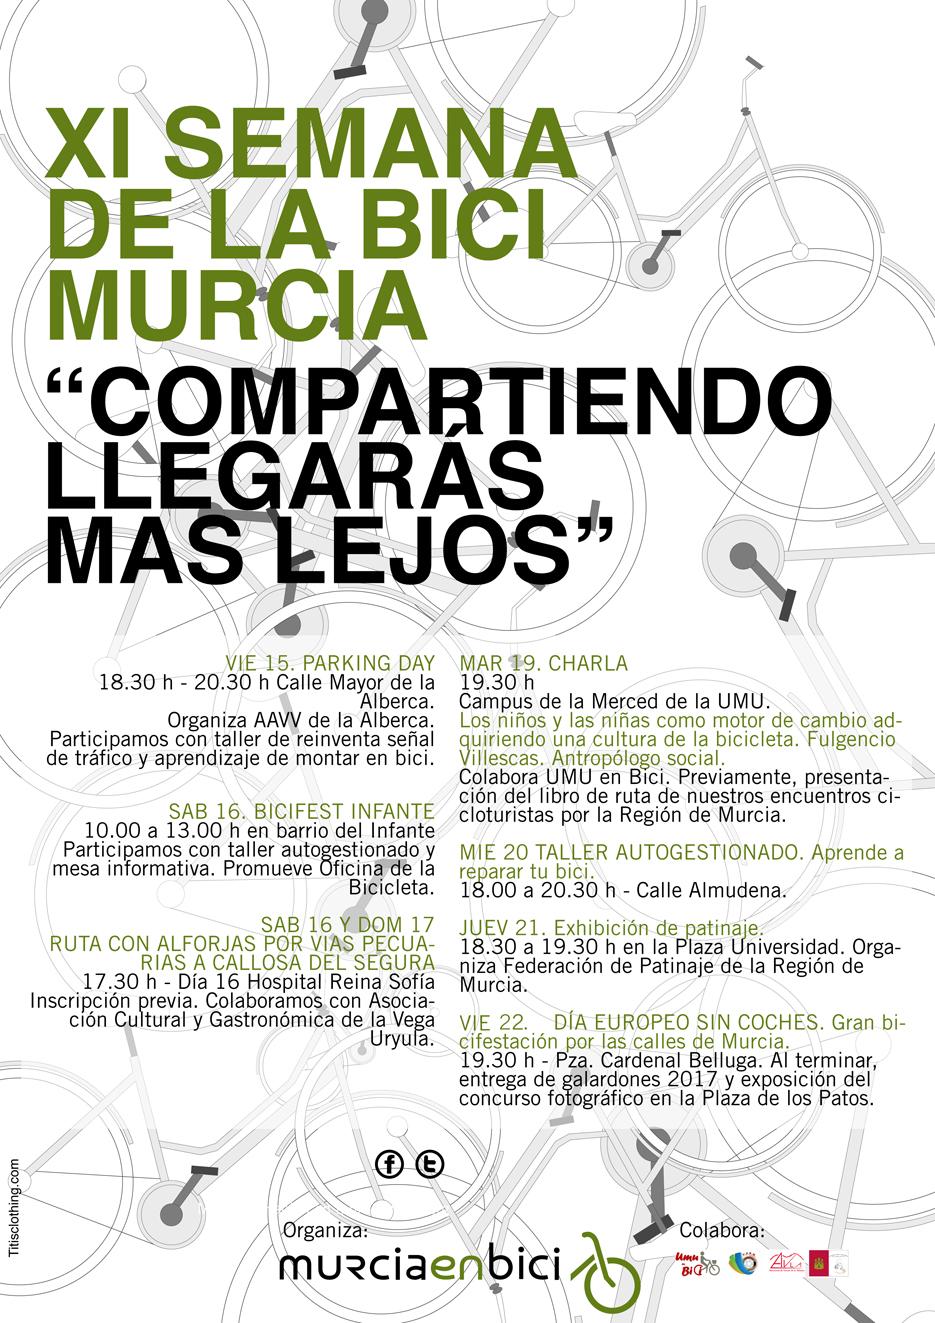 XI Semana de la Bici de Murcia en Bici